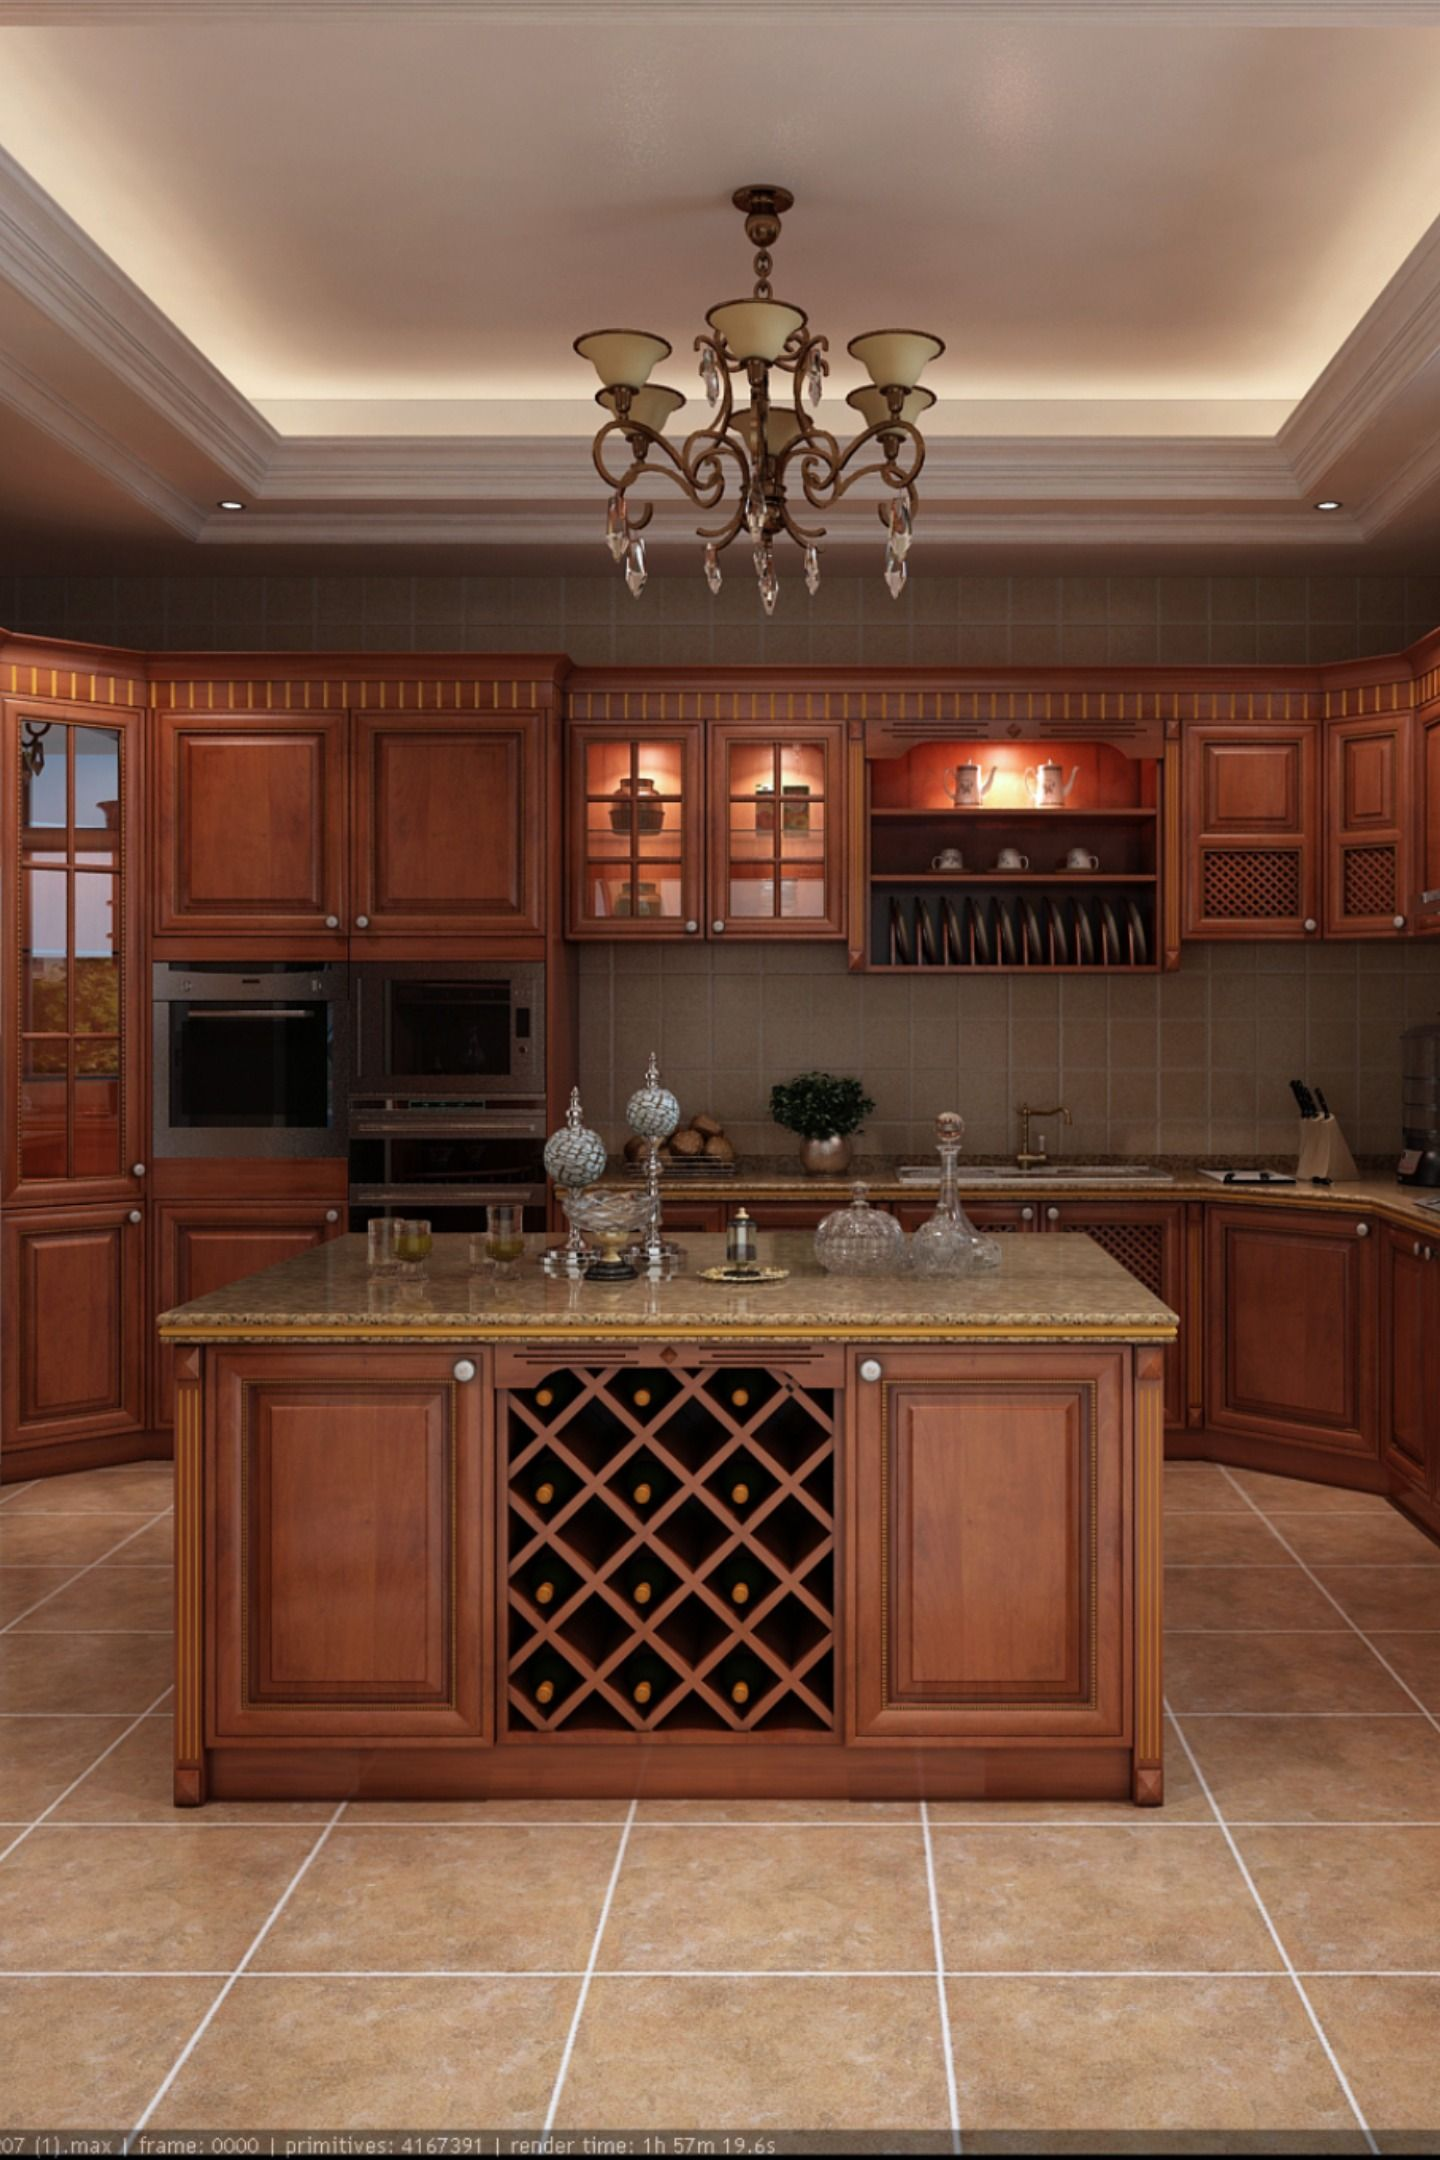 2020 Pvc Blister Kitchen Cabinet Kitchen Cabinets Walnut Kitchen Cabinets Custom Kitchen Cabinets